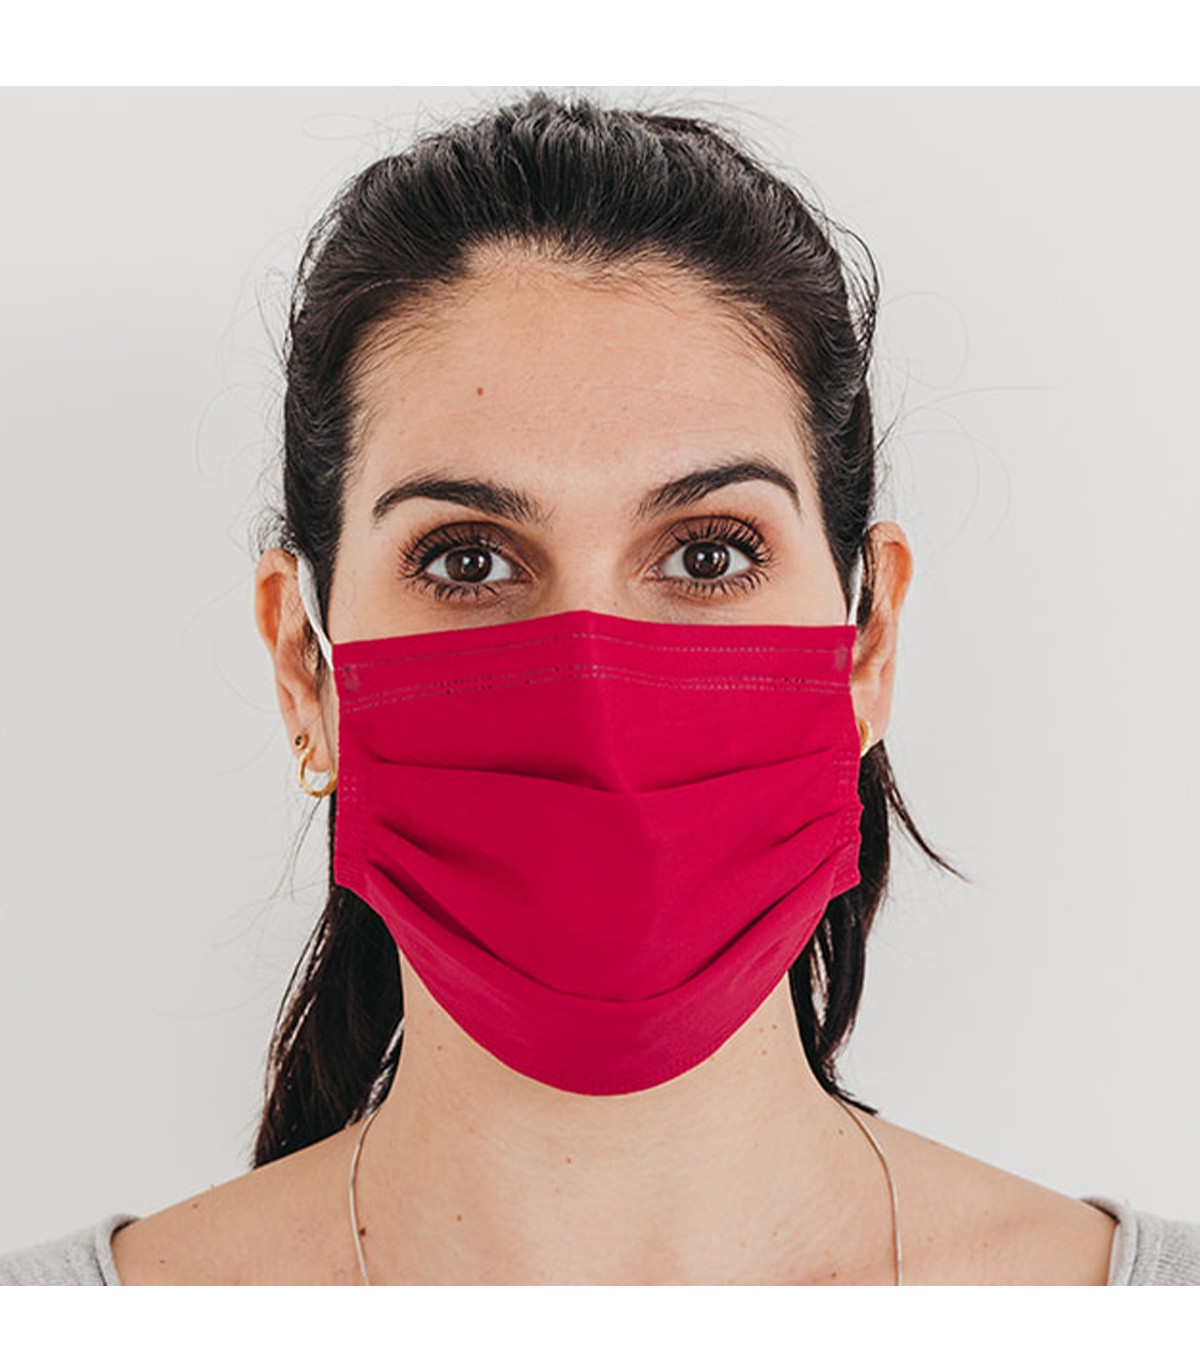 Mascarilla quirúrgica textil reutilizable - fucsia